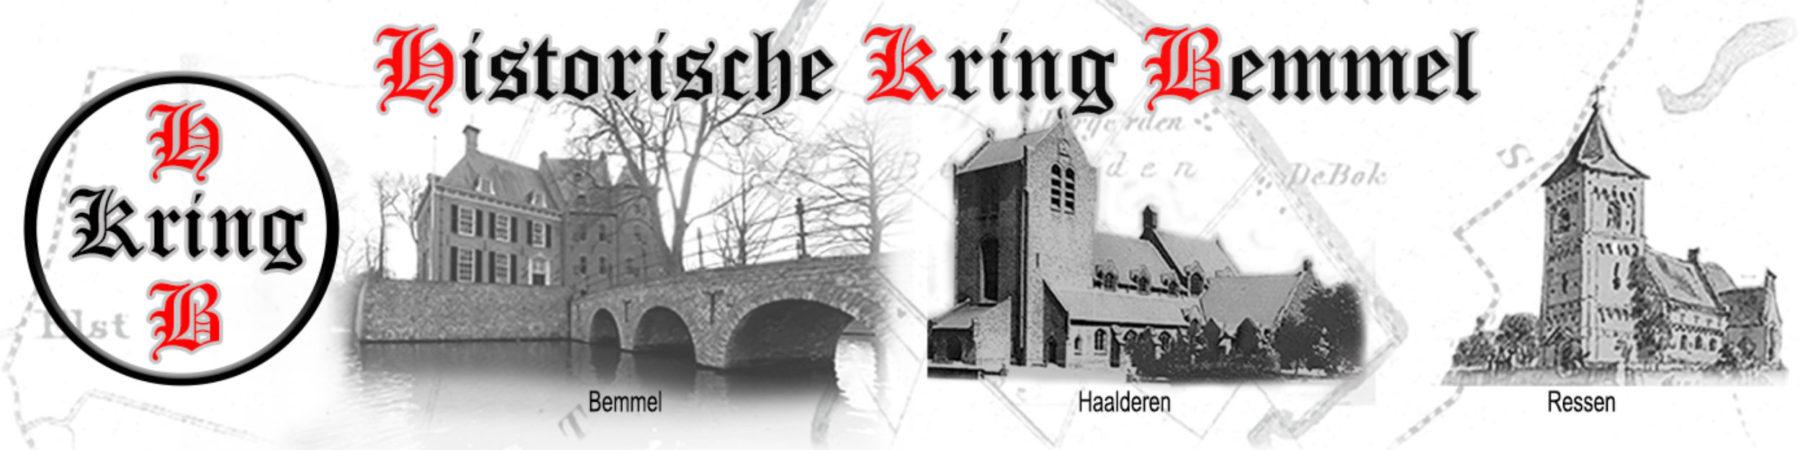 Historische Kring Bemmel